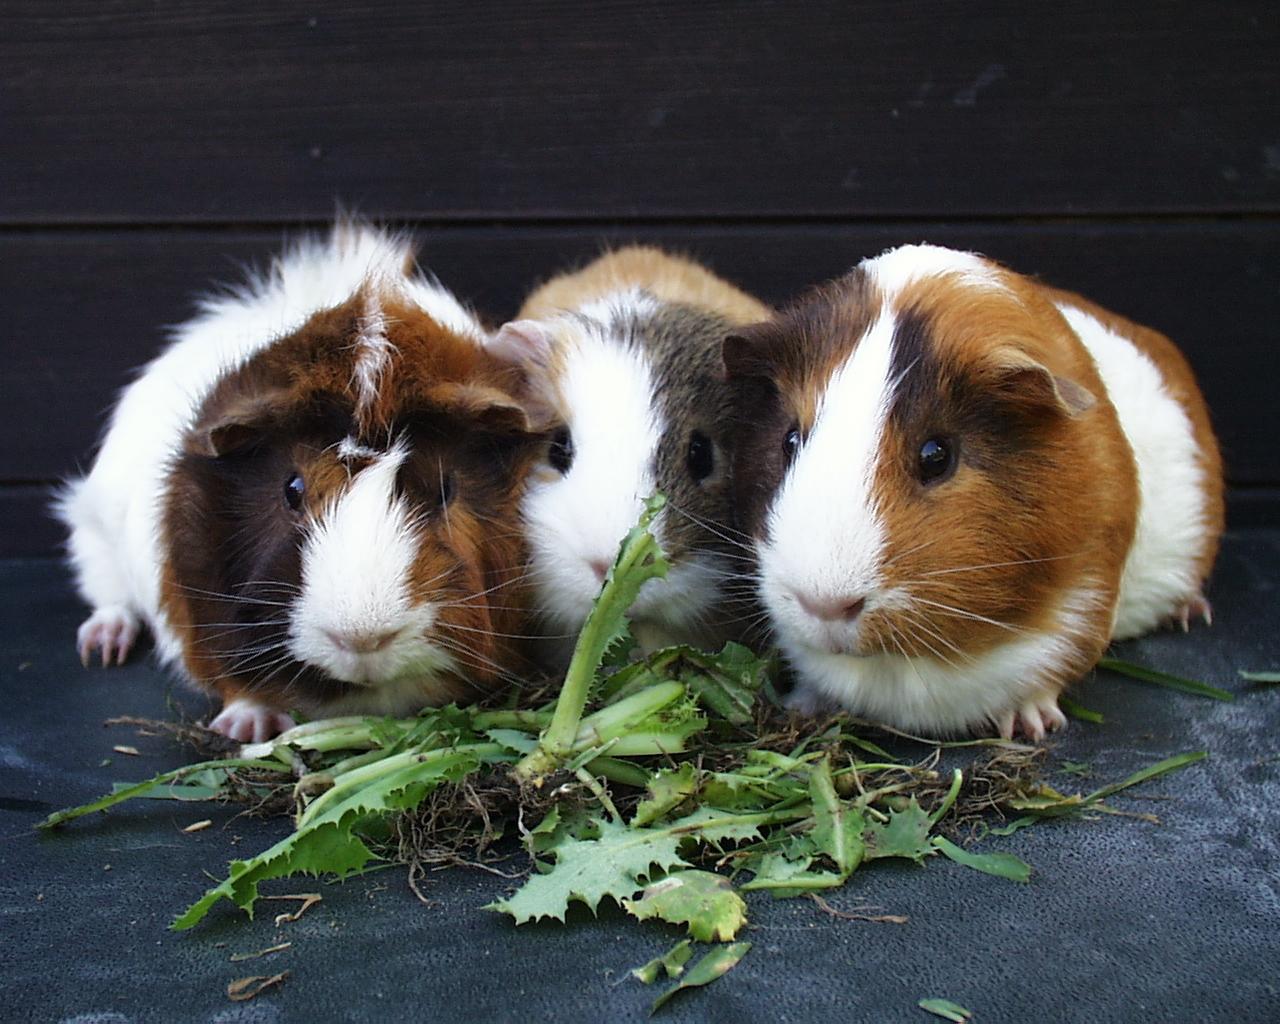 Guinea Pigs   Guinea Pigs Wallpaper 15107594 1280x1024